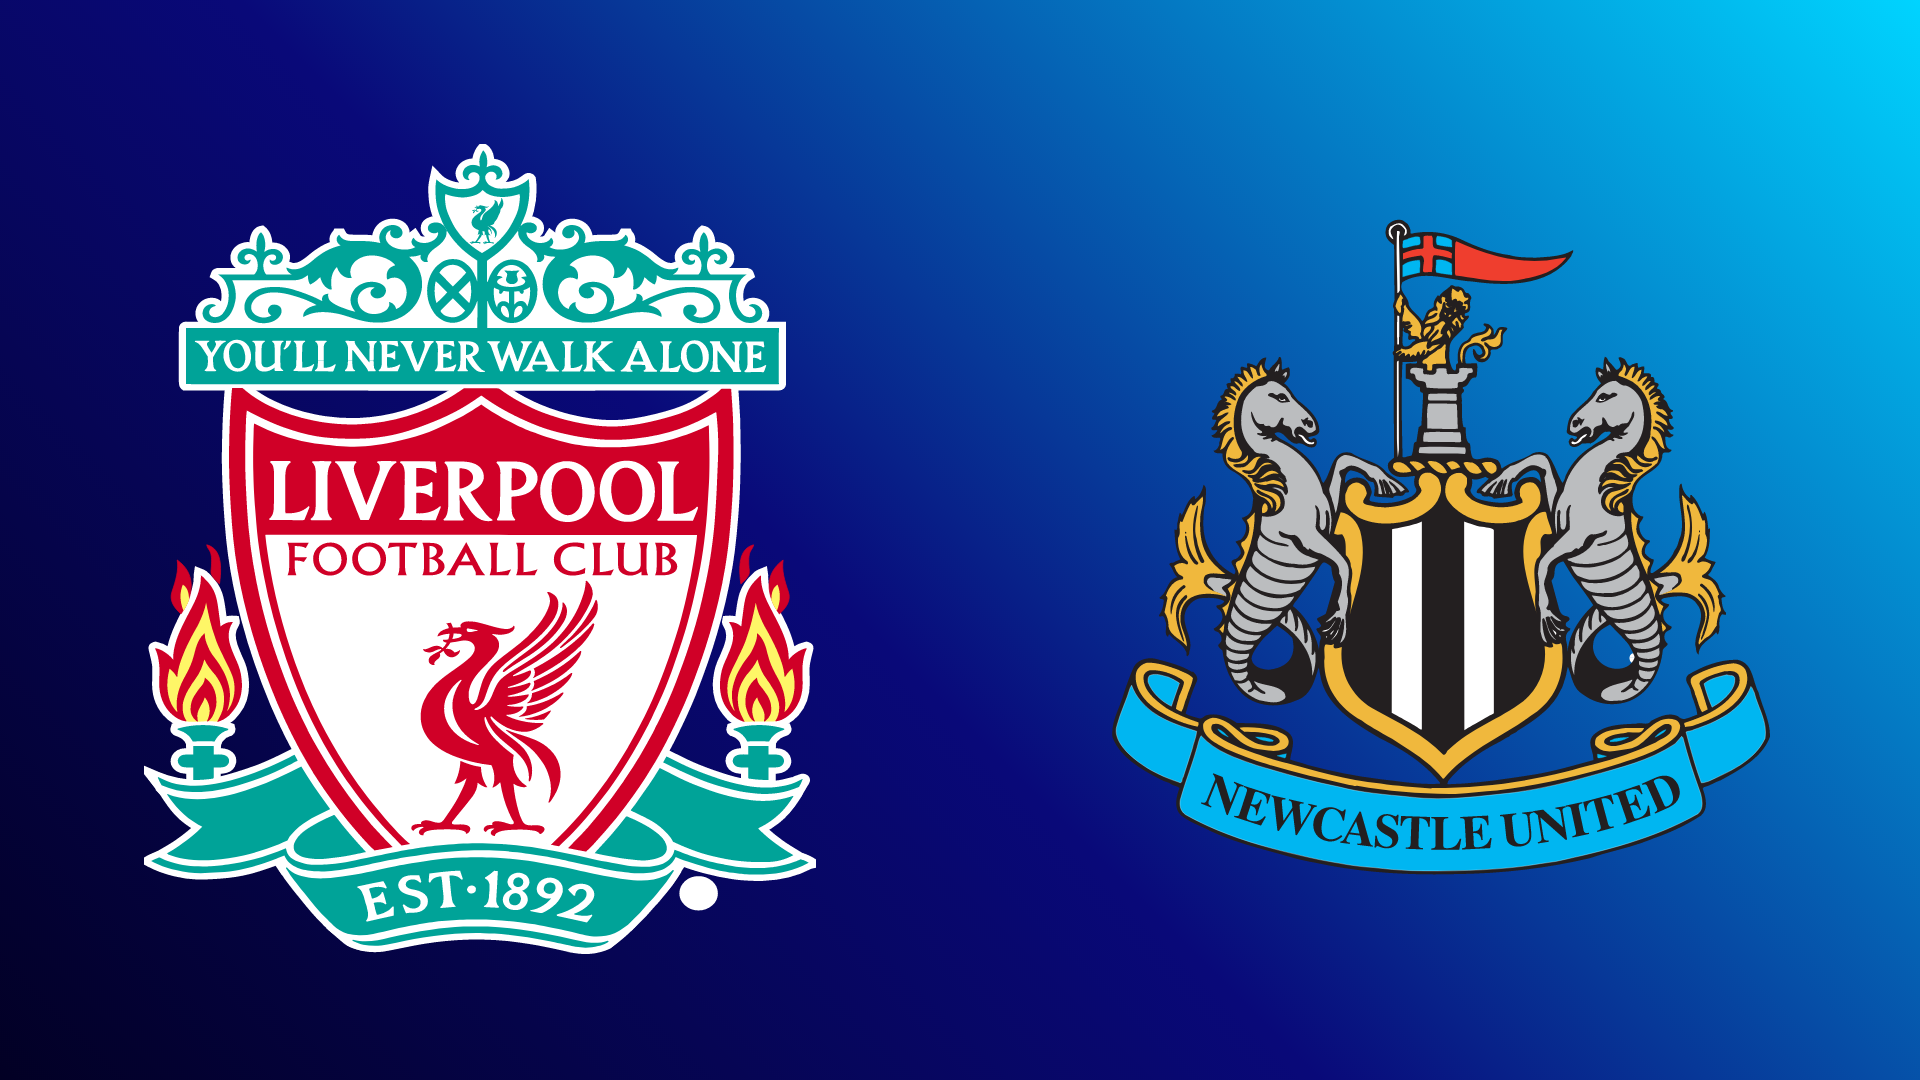 Live PL: FC Liverpool - Newcastle United, 33. Spieltag 24.04.2021 um 13:20 Uhr auf Sky Ticket